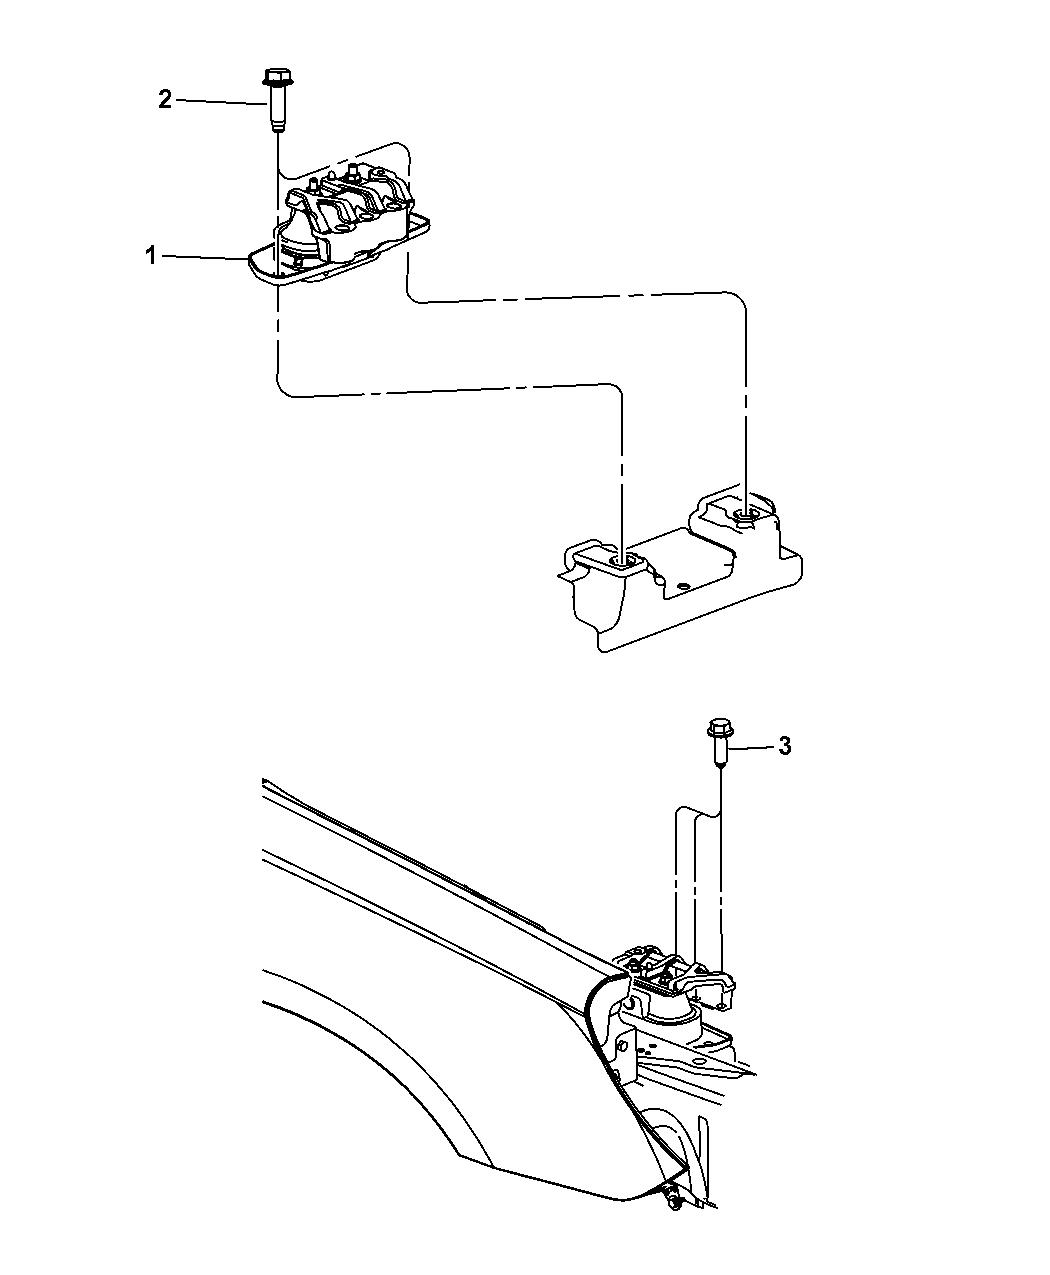 2009 Dodge Avenger Engine Mounting Mopar Parts Giant Diagram Thumbnail 12